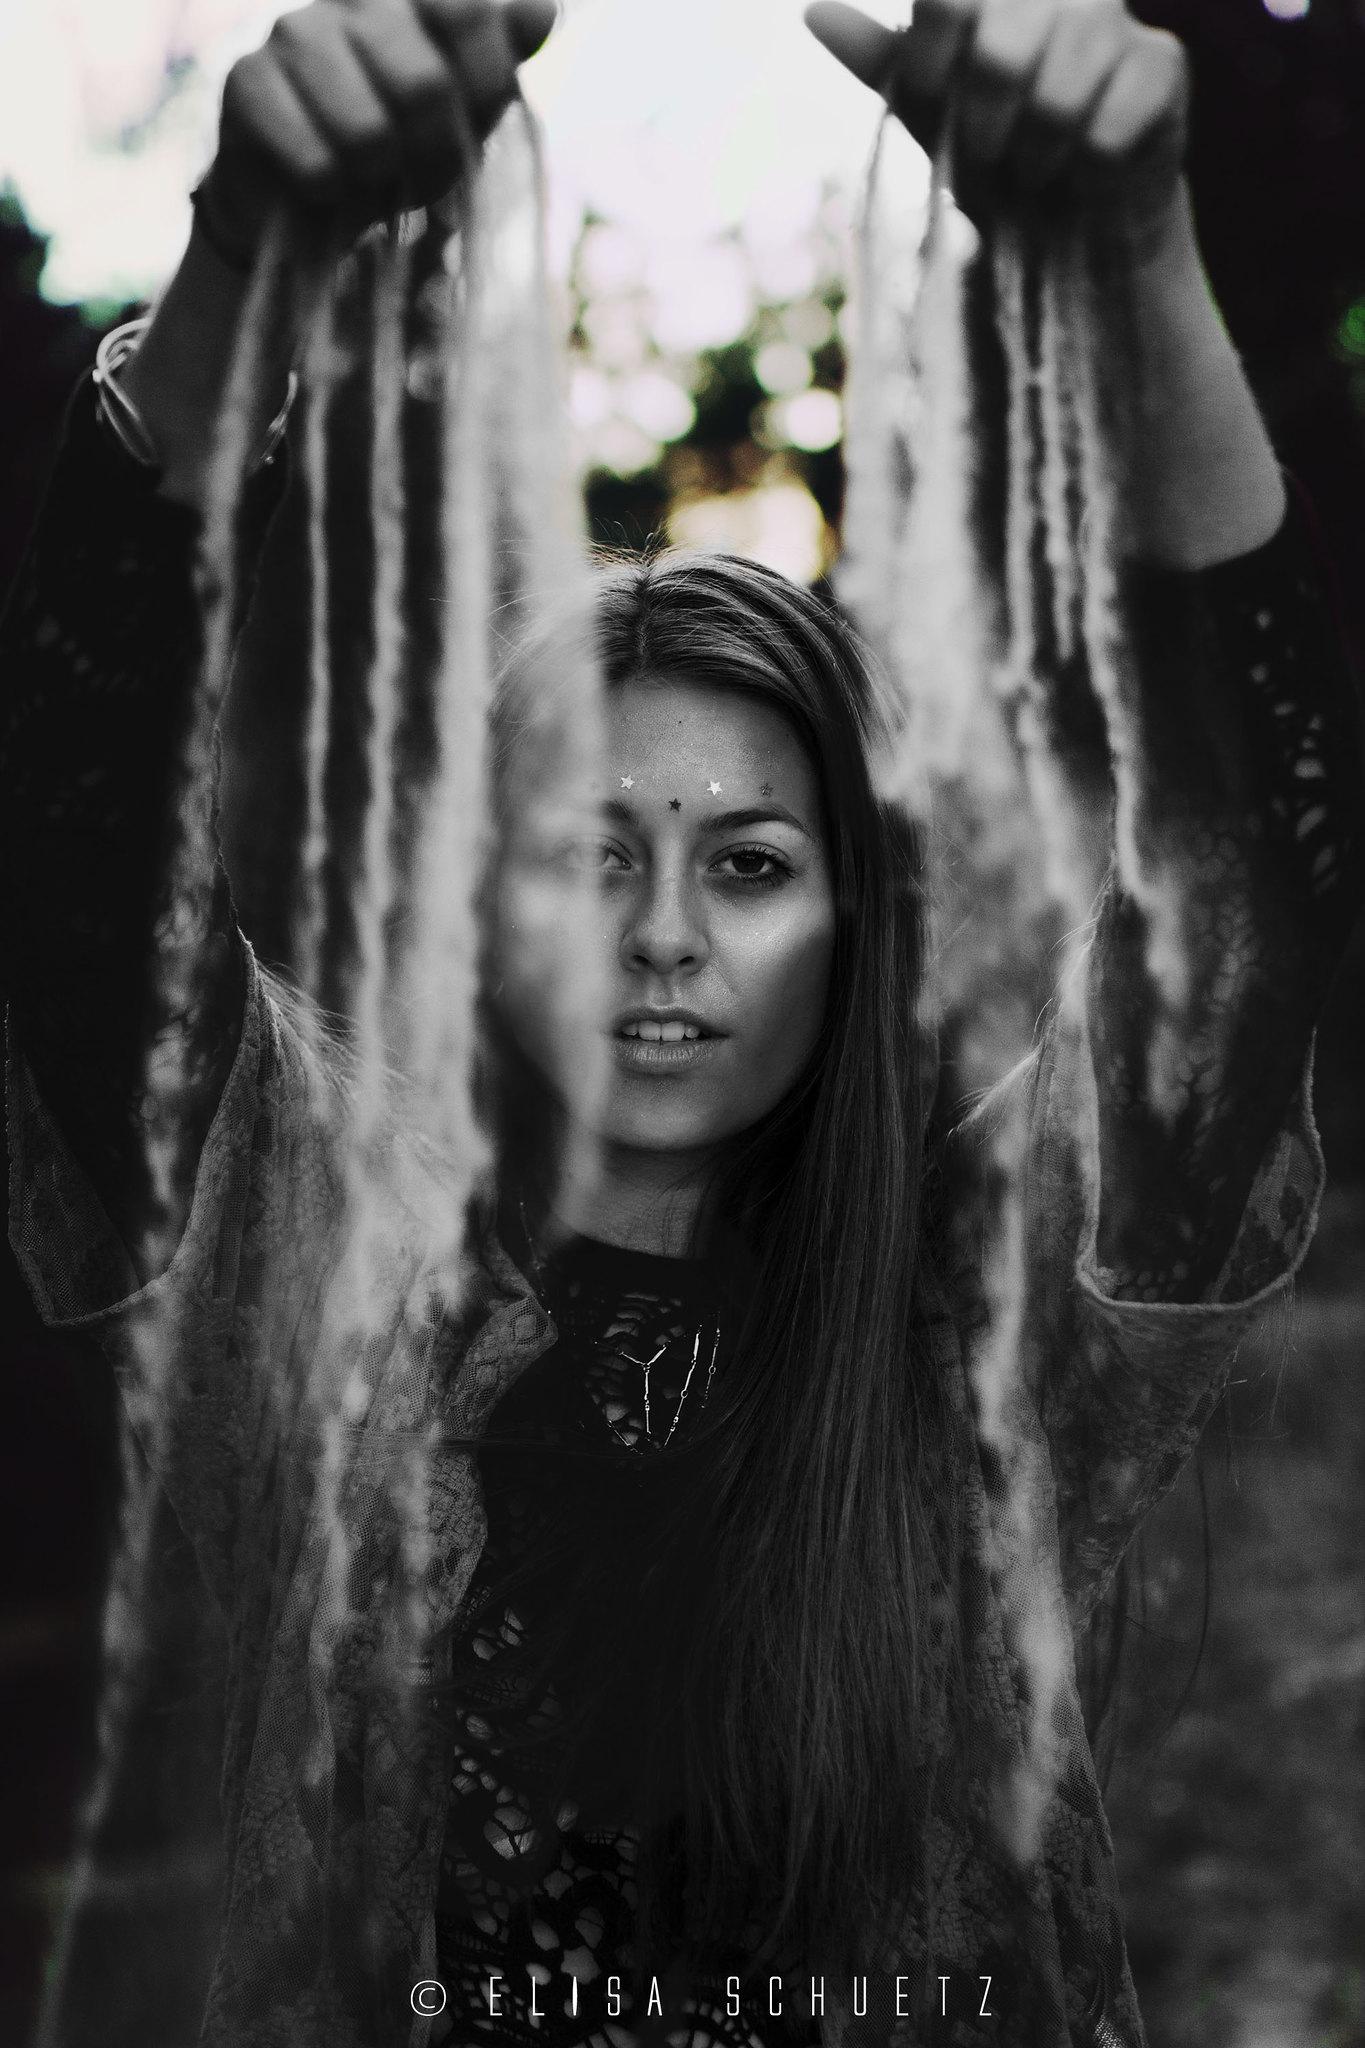 Tschyarah_by_ems_5